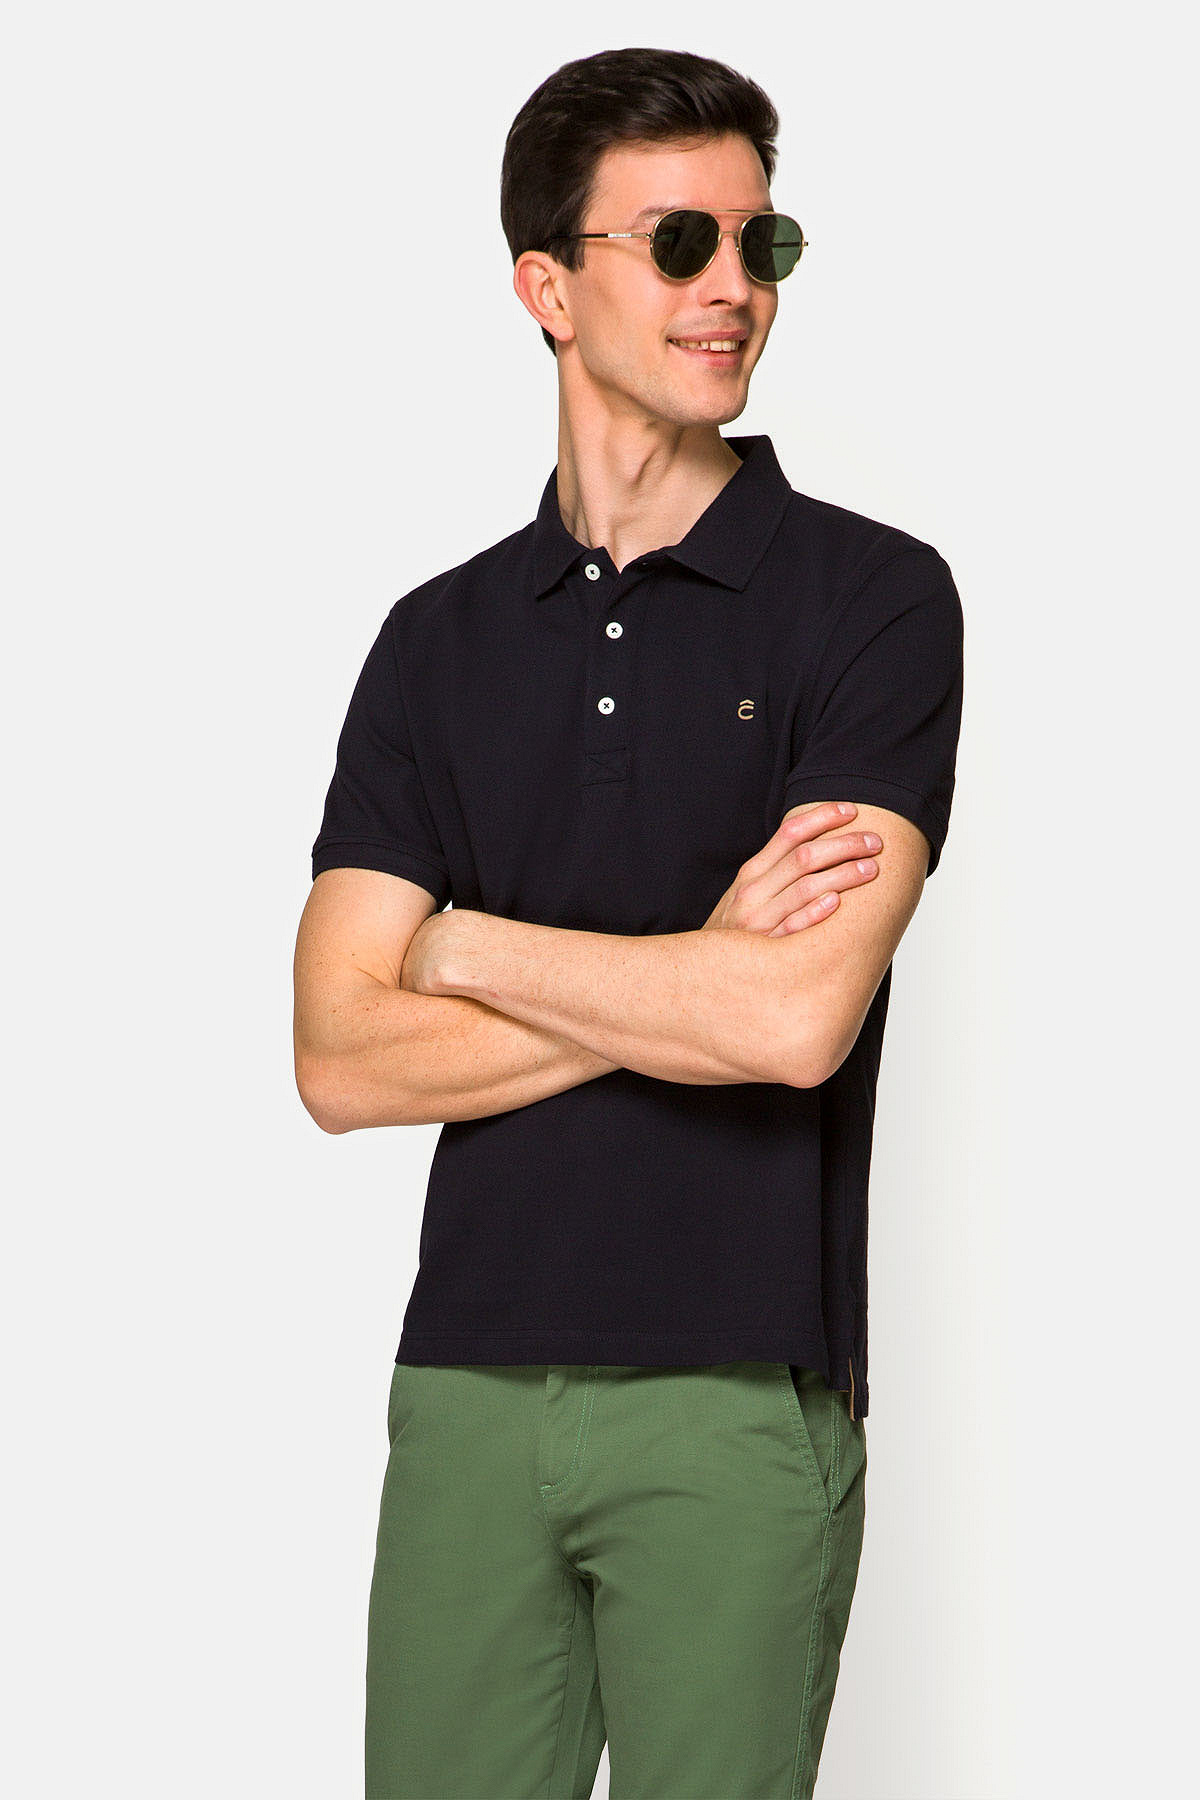 Koszulka Ciemnogranatowa Polo Patrick rozmiar 2XL; 3XL; 4XL; 5XL; L; M; XL